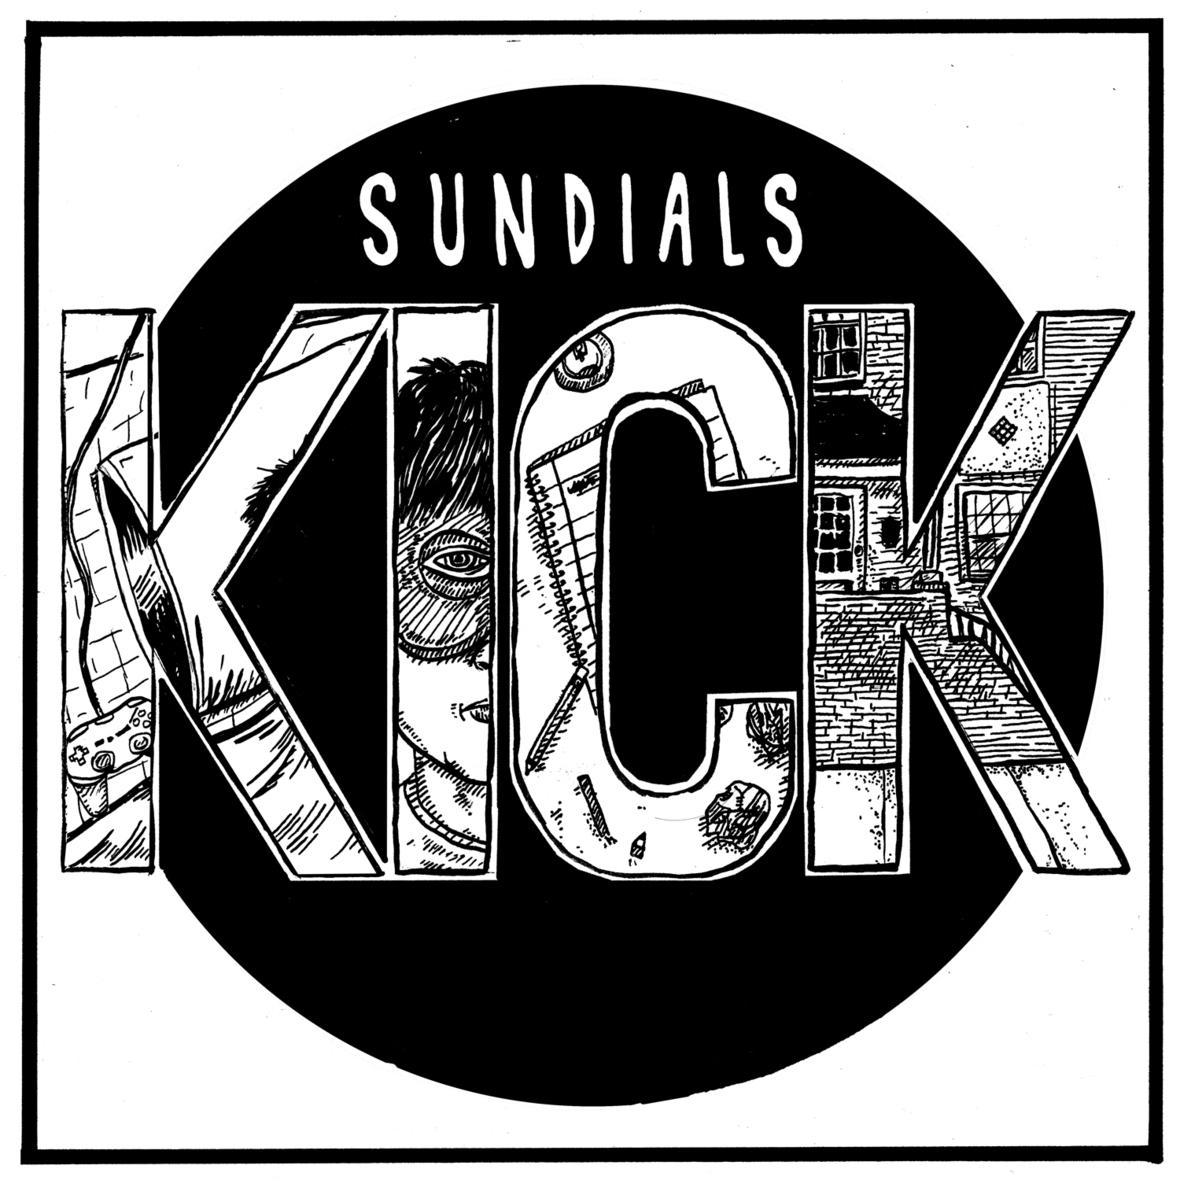 sundials kick cover art